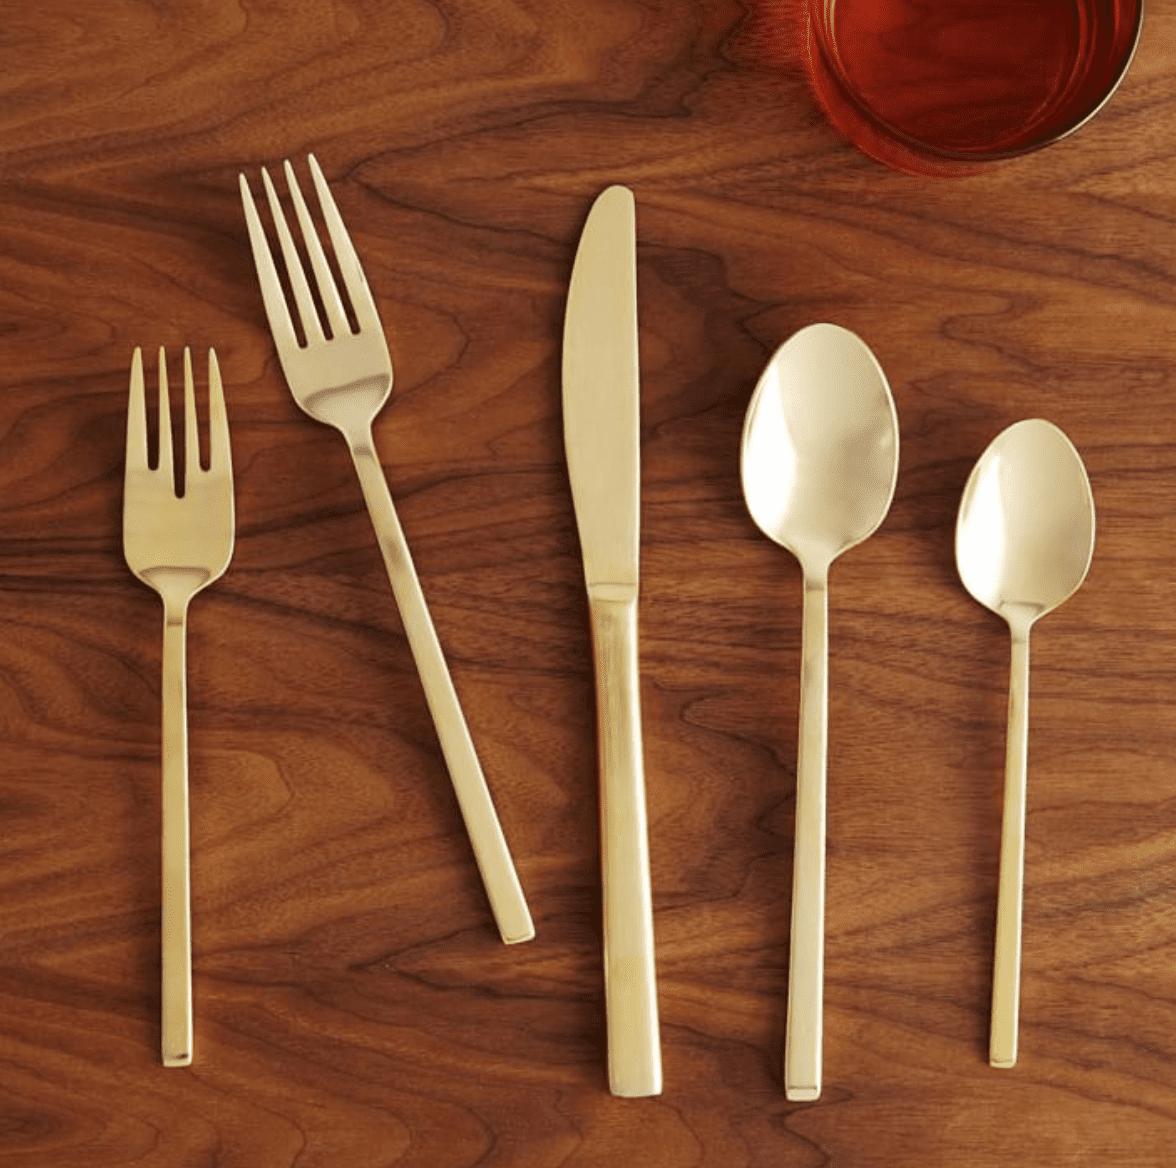 Blair Stainless Steel Gold Flatware (20-Piece Set)